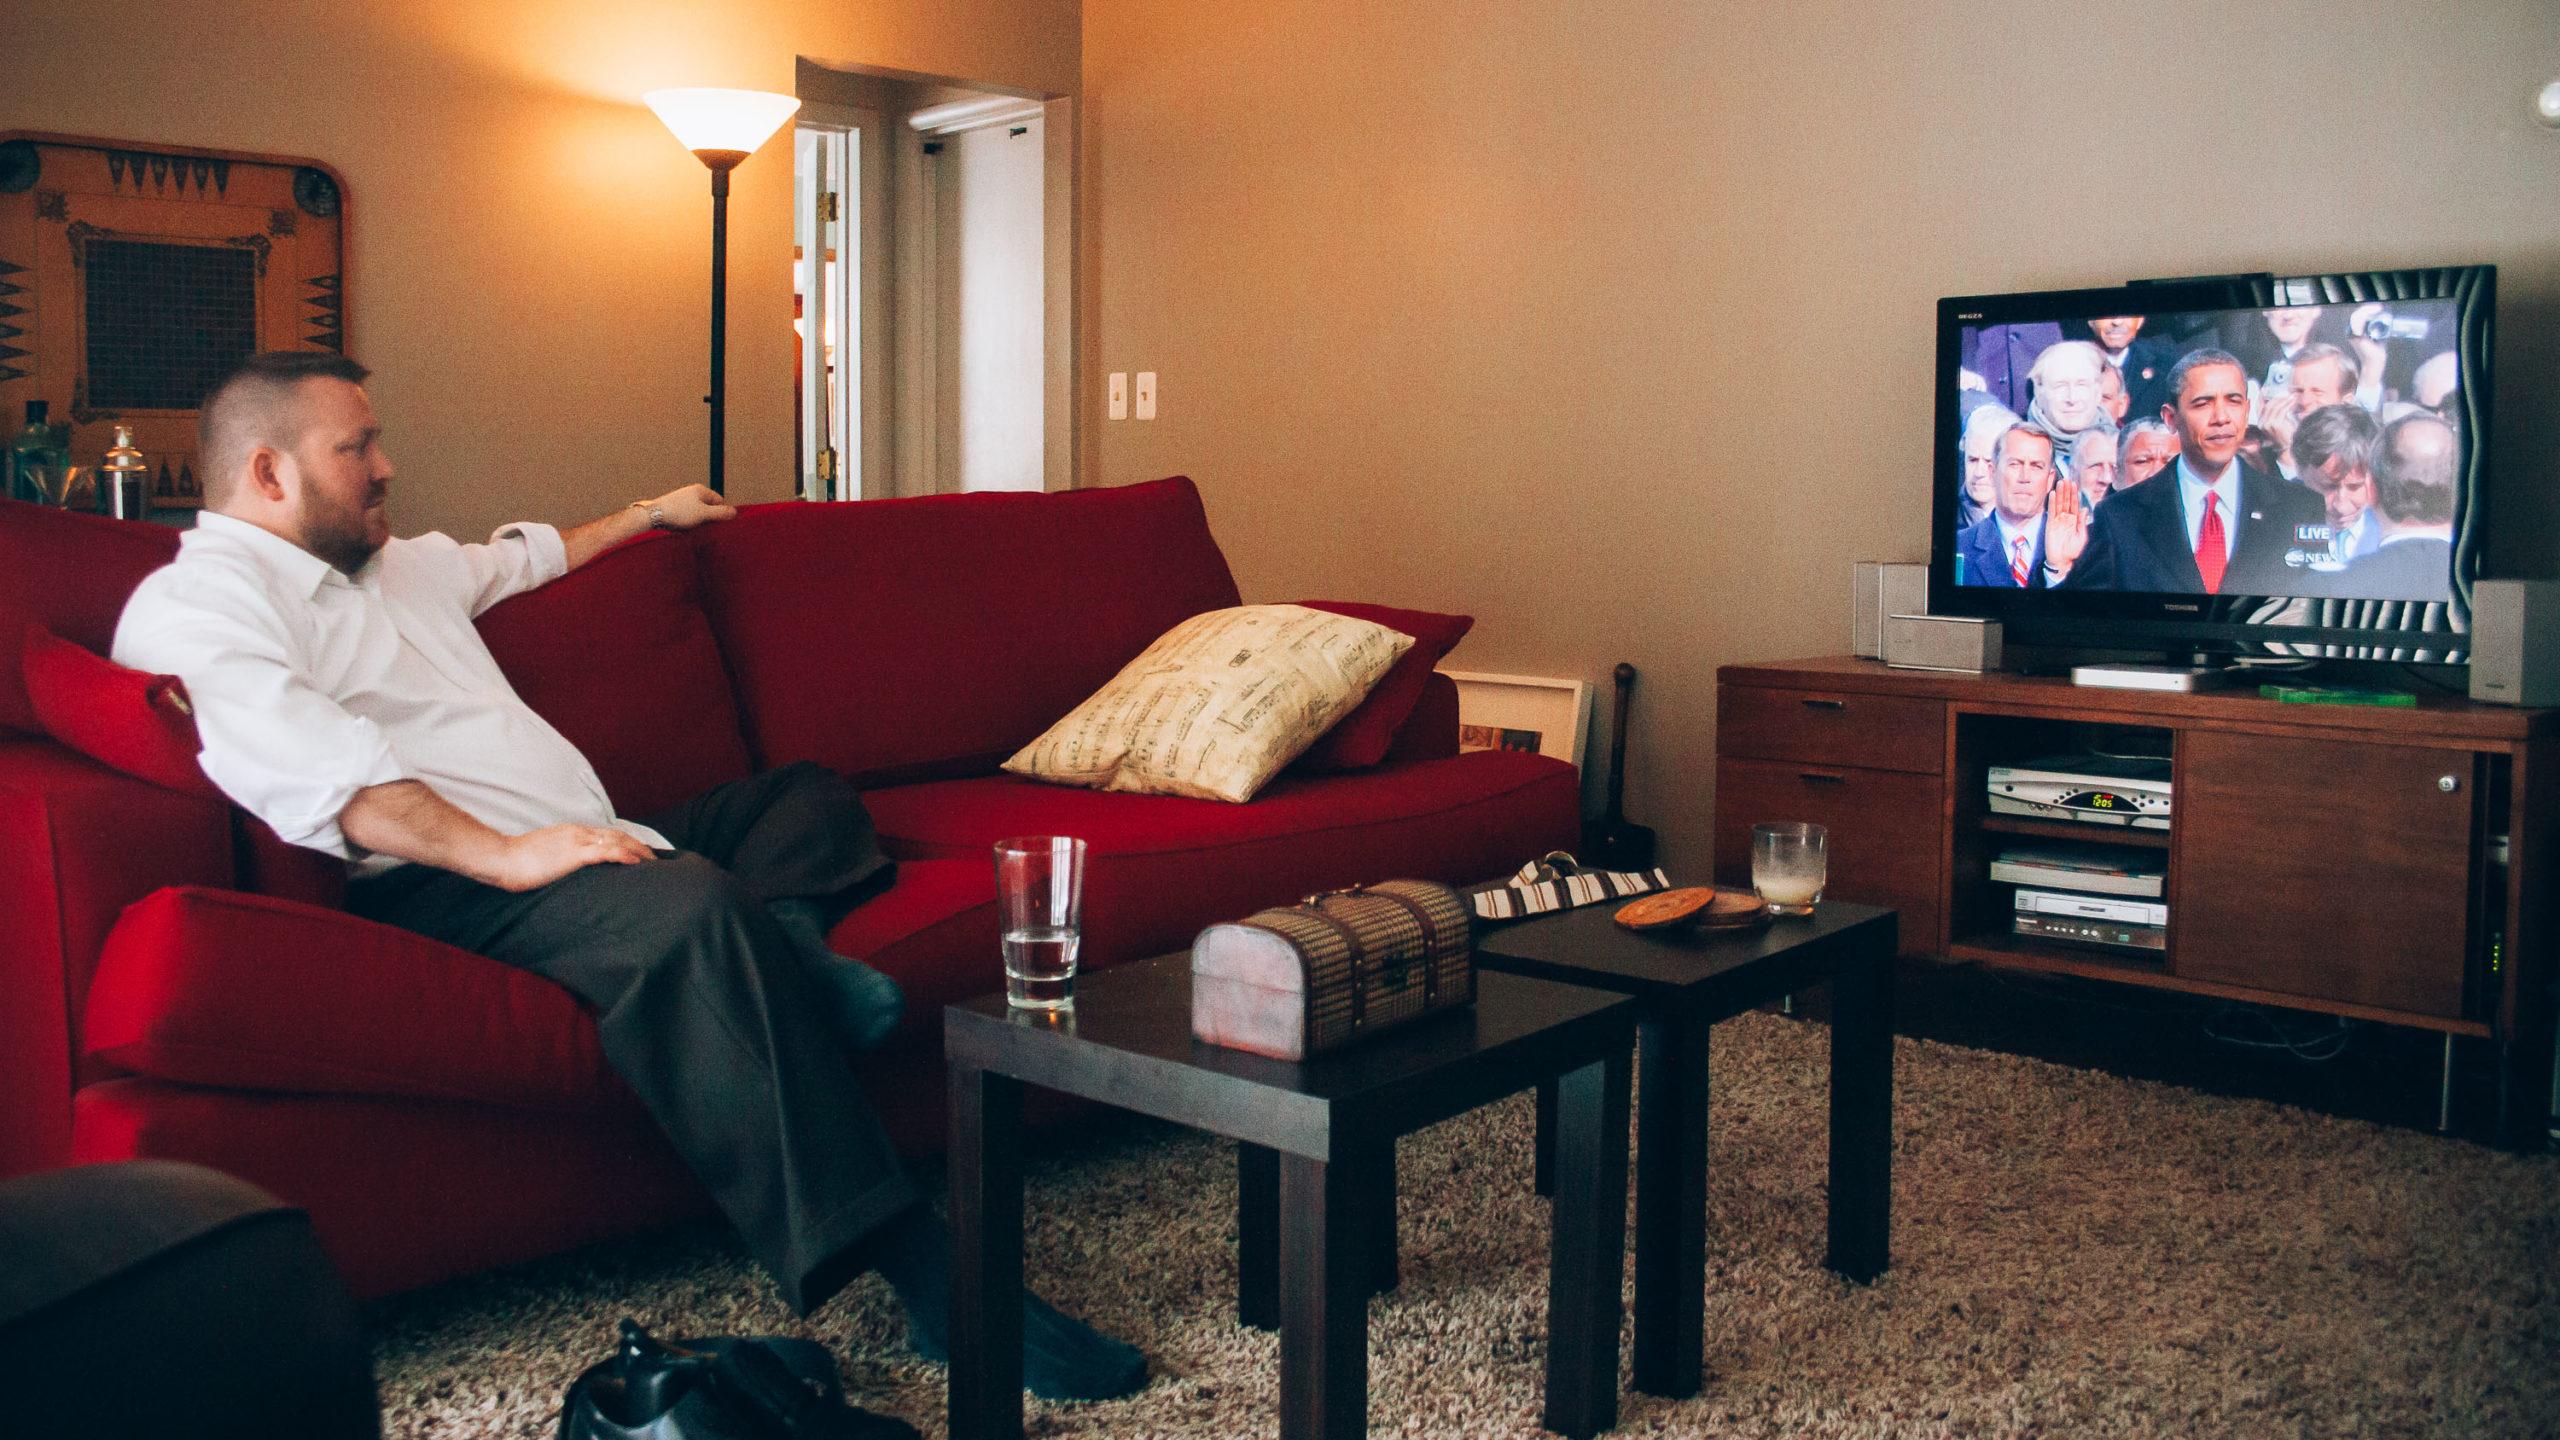 Obama Inauguration on the television in Dayton, Ohio